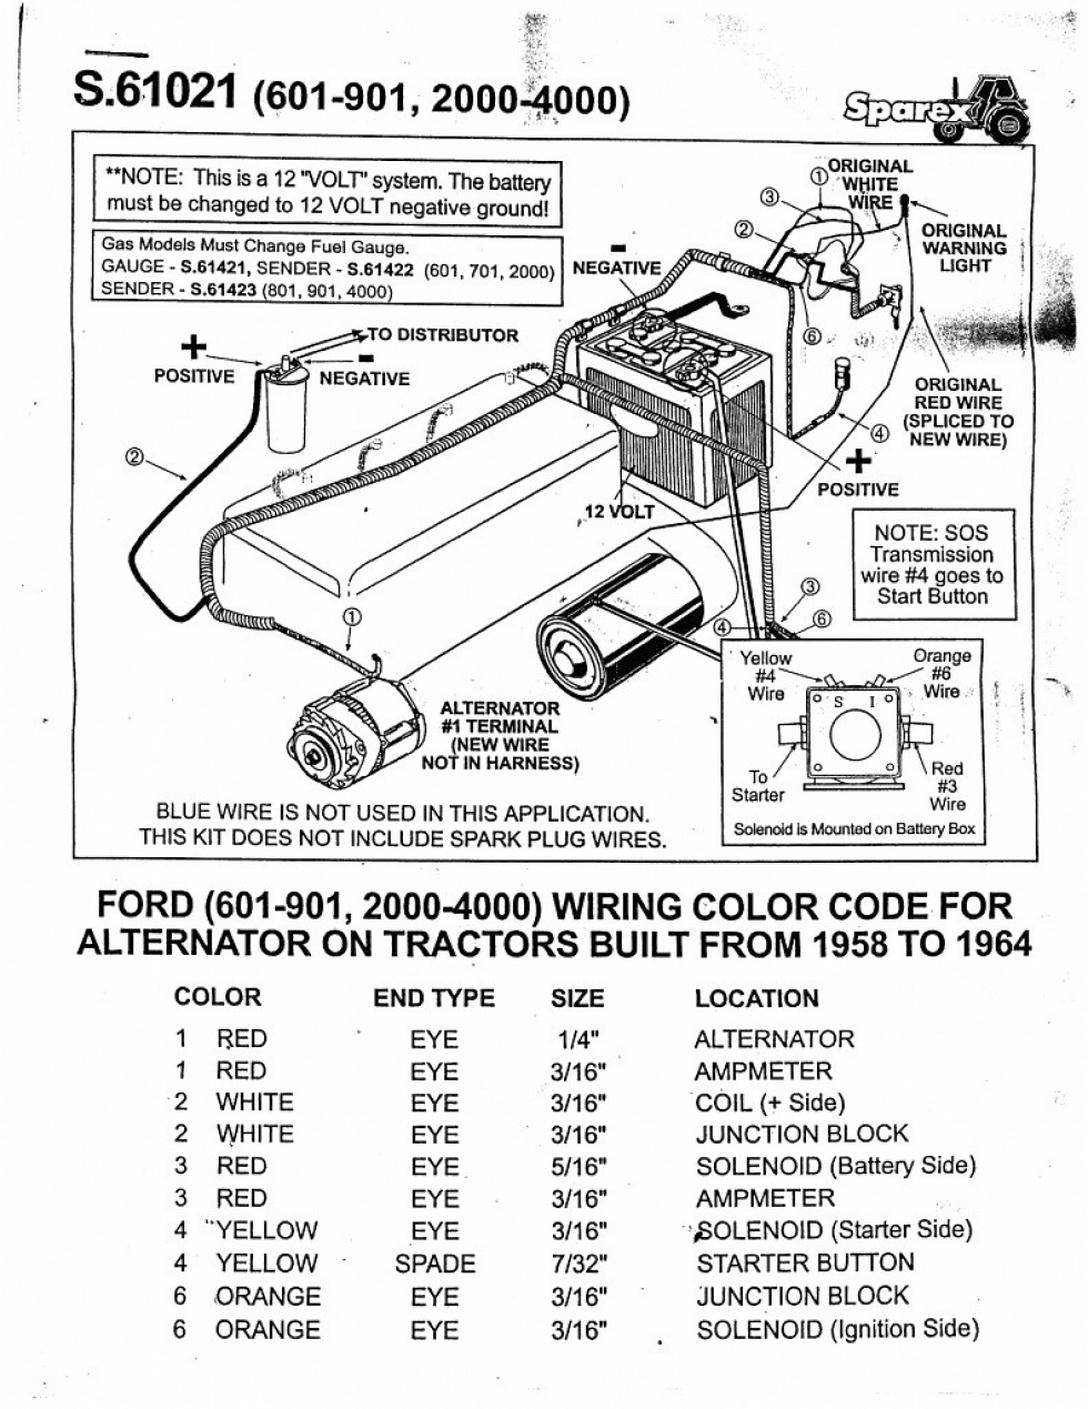 Diagram] 12V Wiring Diagram Ford 800 Tractor Full Version Hd